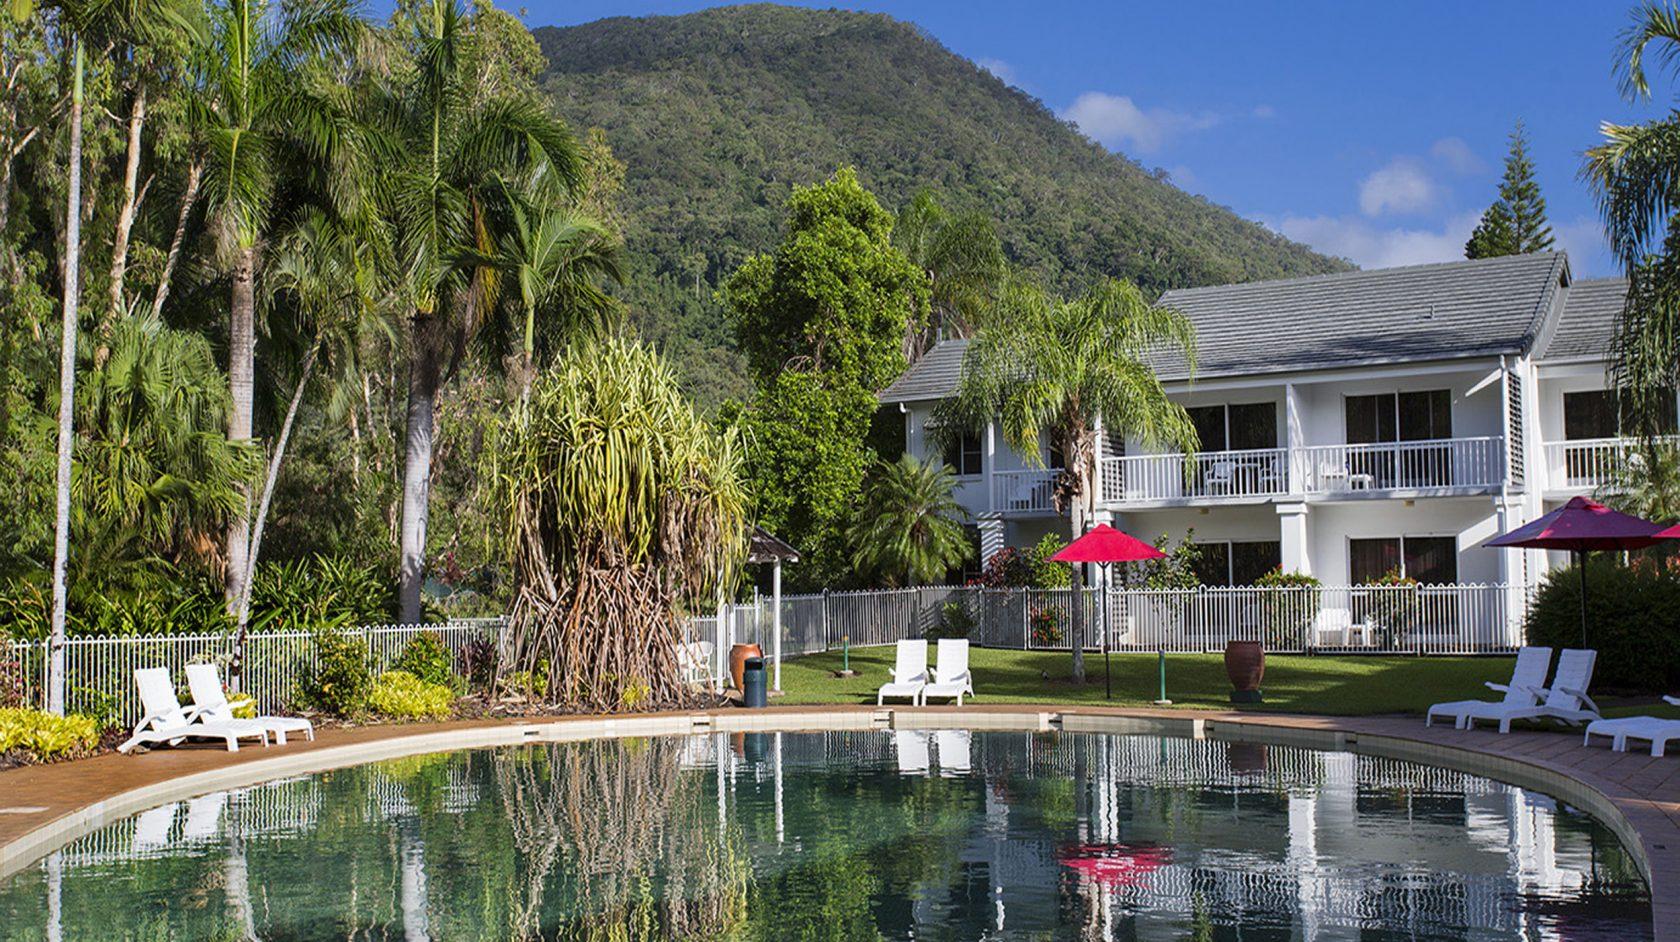 Hotel in Palm Cove Queensland | Grand Chancellor Palm Cove